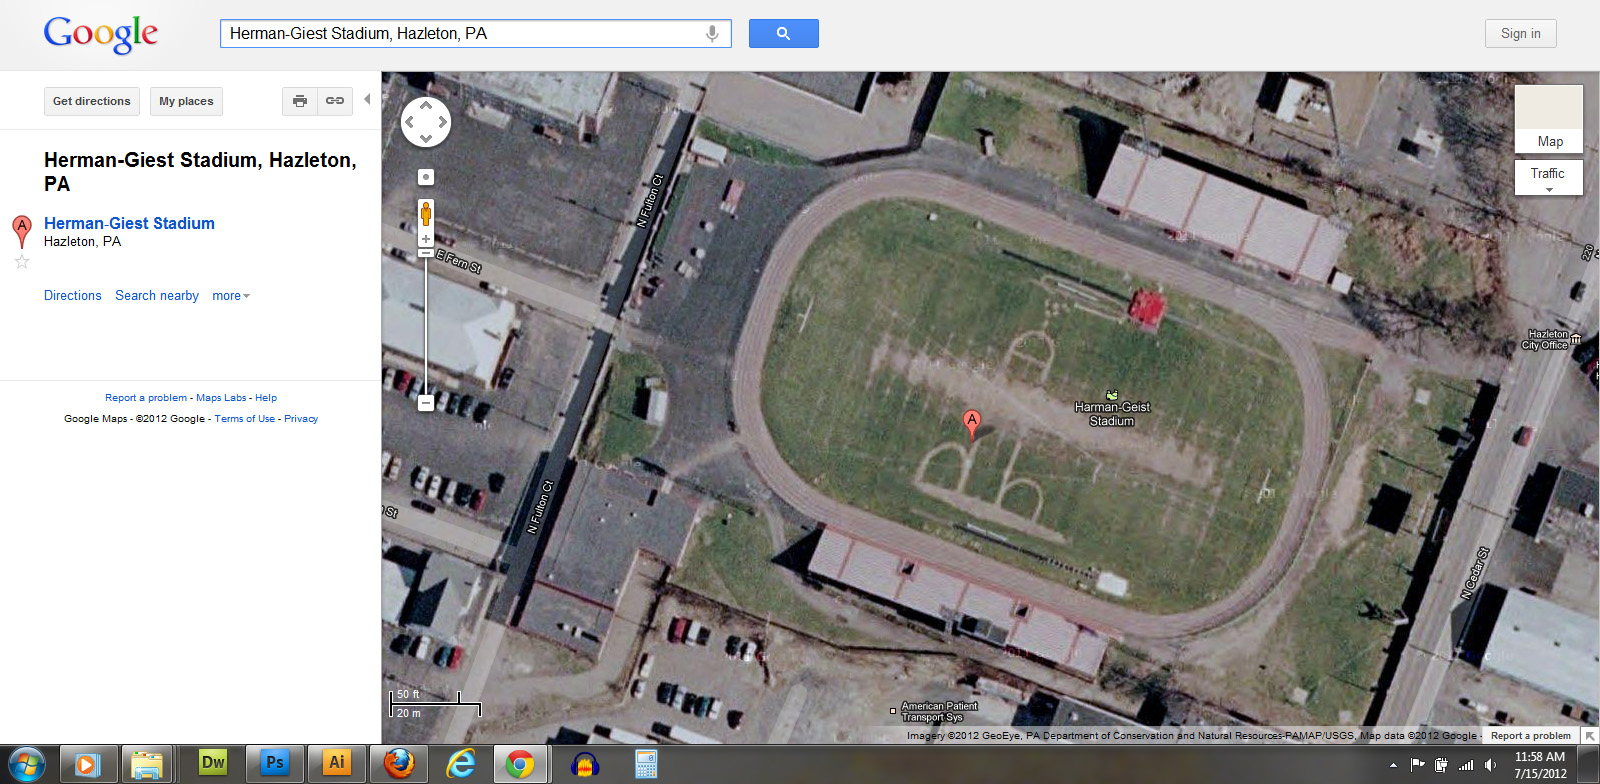 Harman-Geist Stadium, Hazeton, PA (ROTFL)